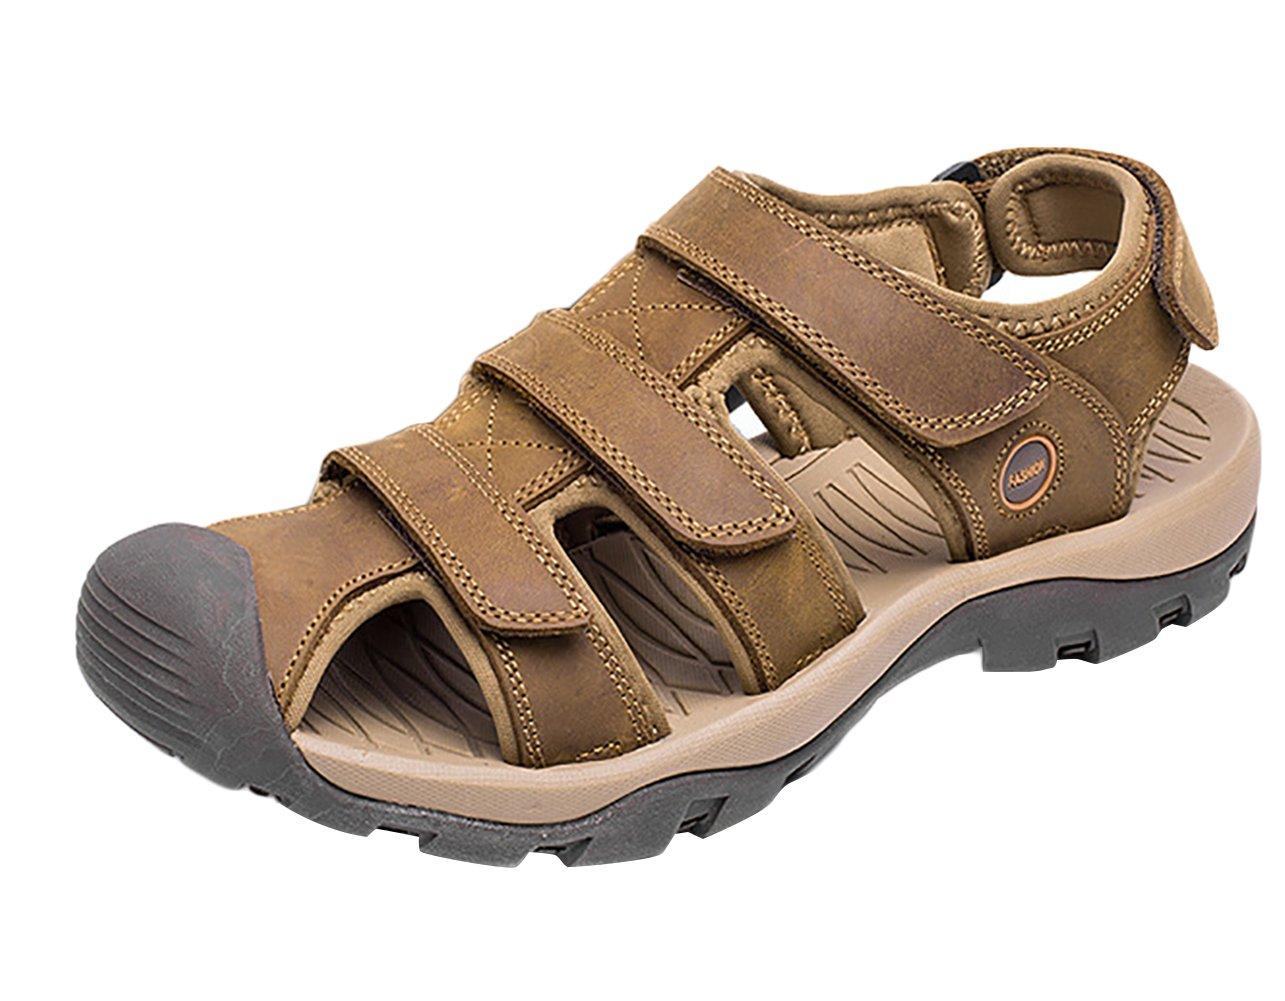 SK Studio Punta Cerrada Sandalias Hombre Trekking de Cuero Talla Grande Transpirables Zapatos Con Velcro 40 EU|Marrón Claro